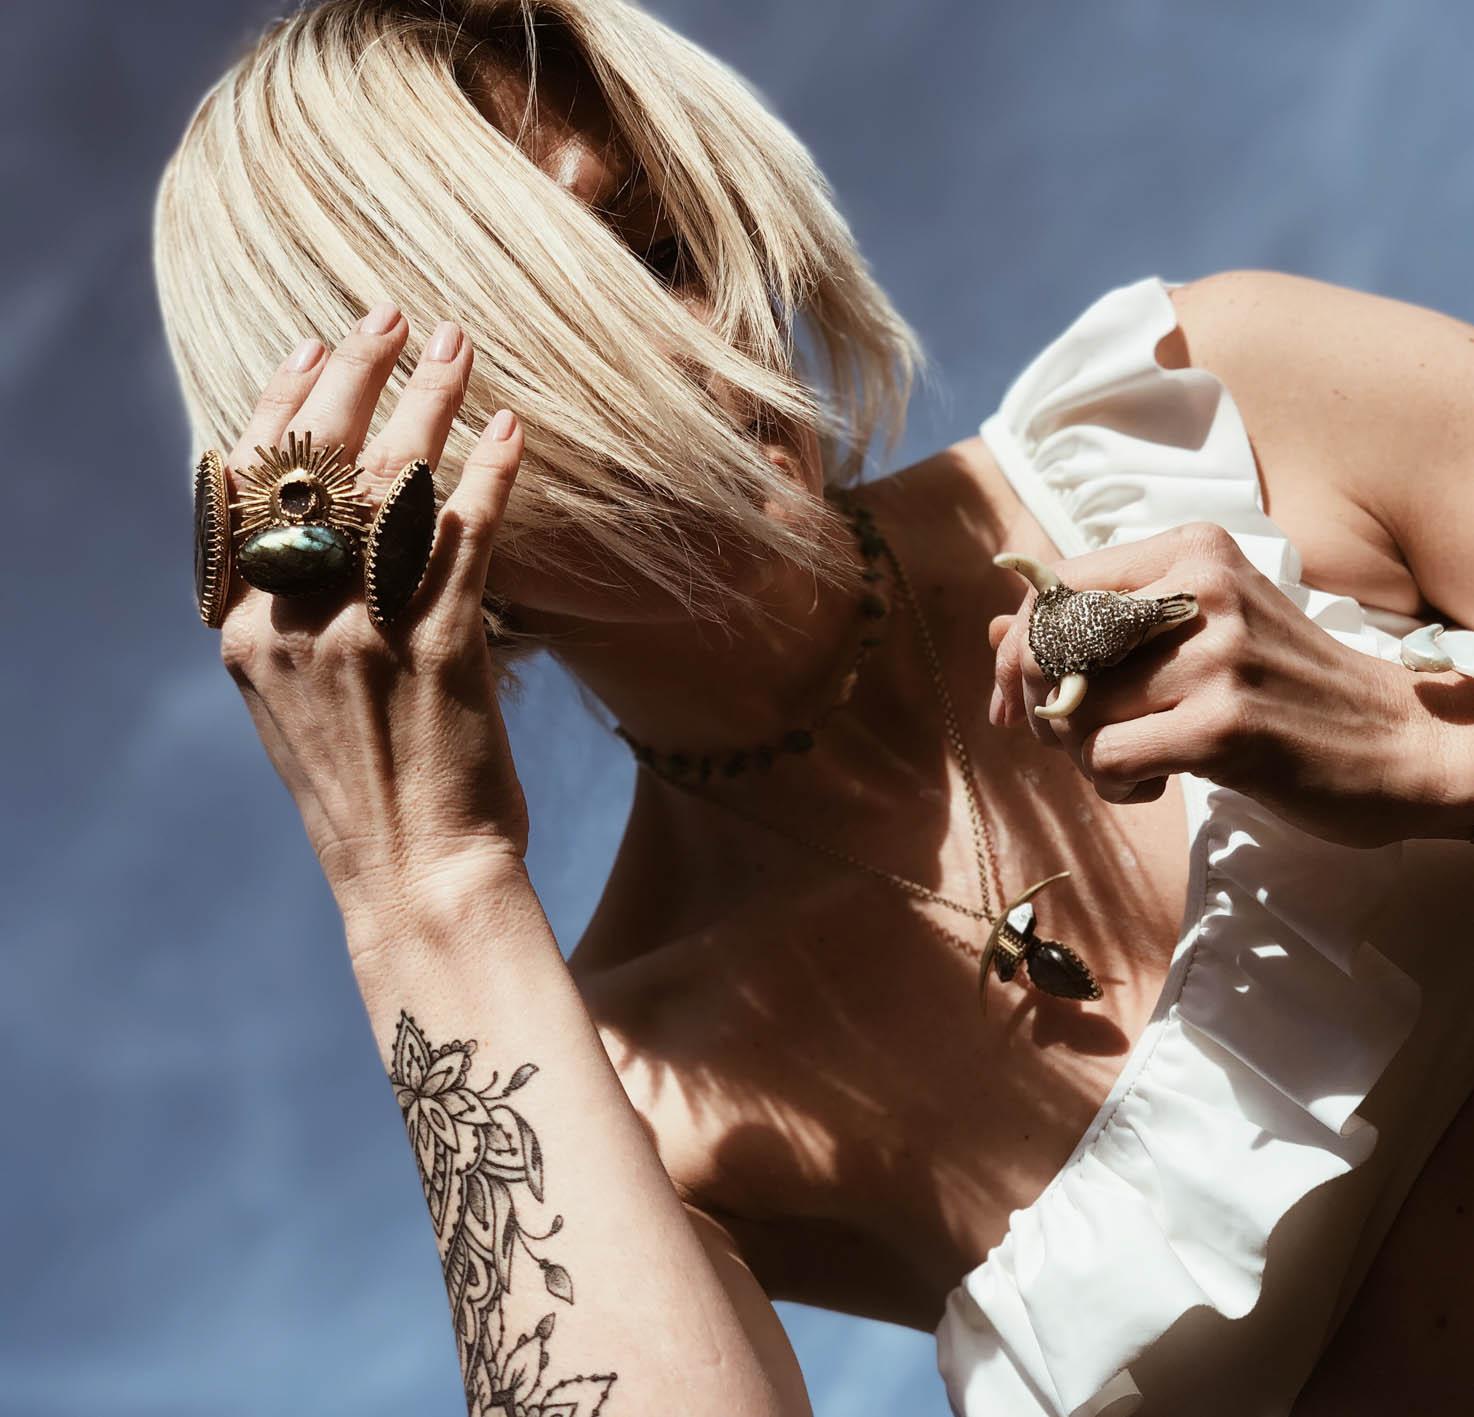 Carnet sauvage- blog mode et tendances - christina rose jewelry36.jpg